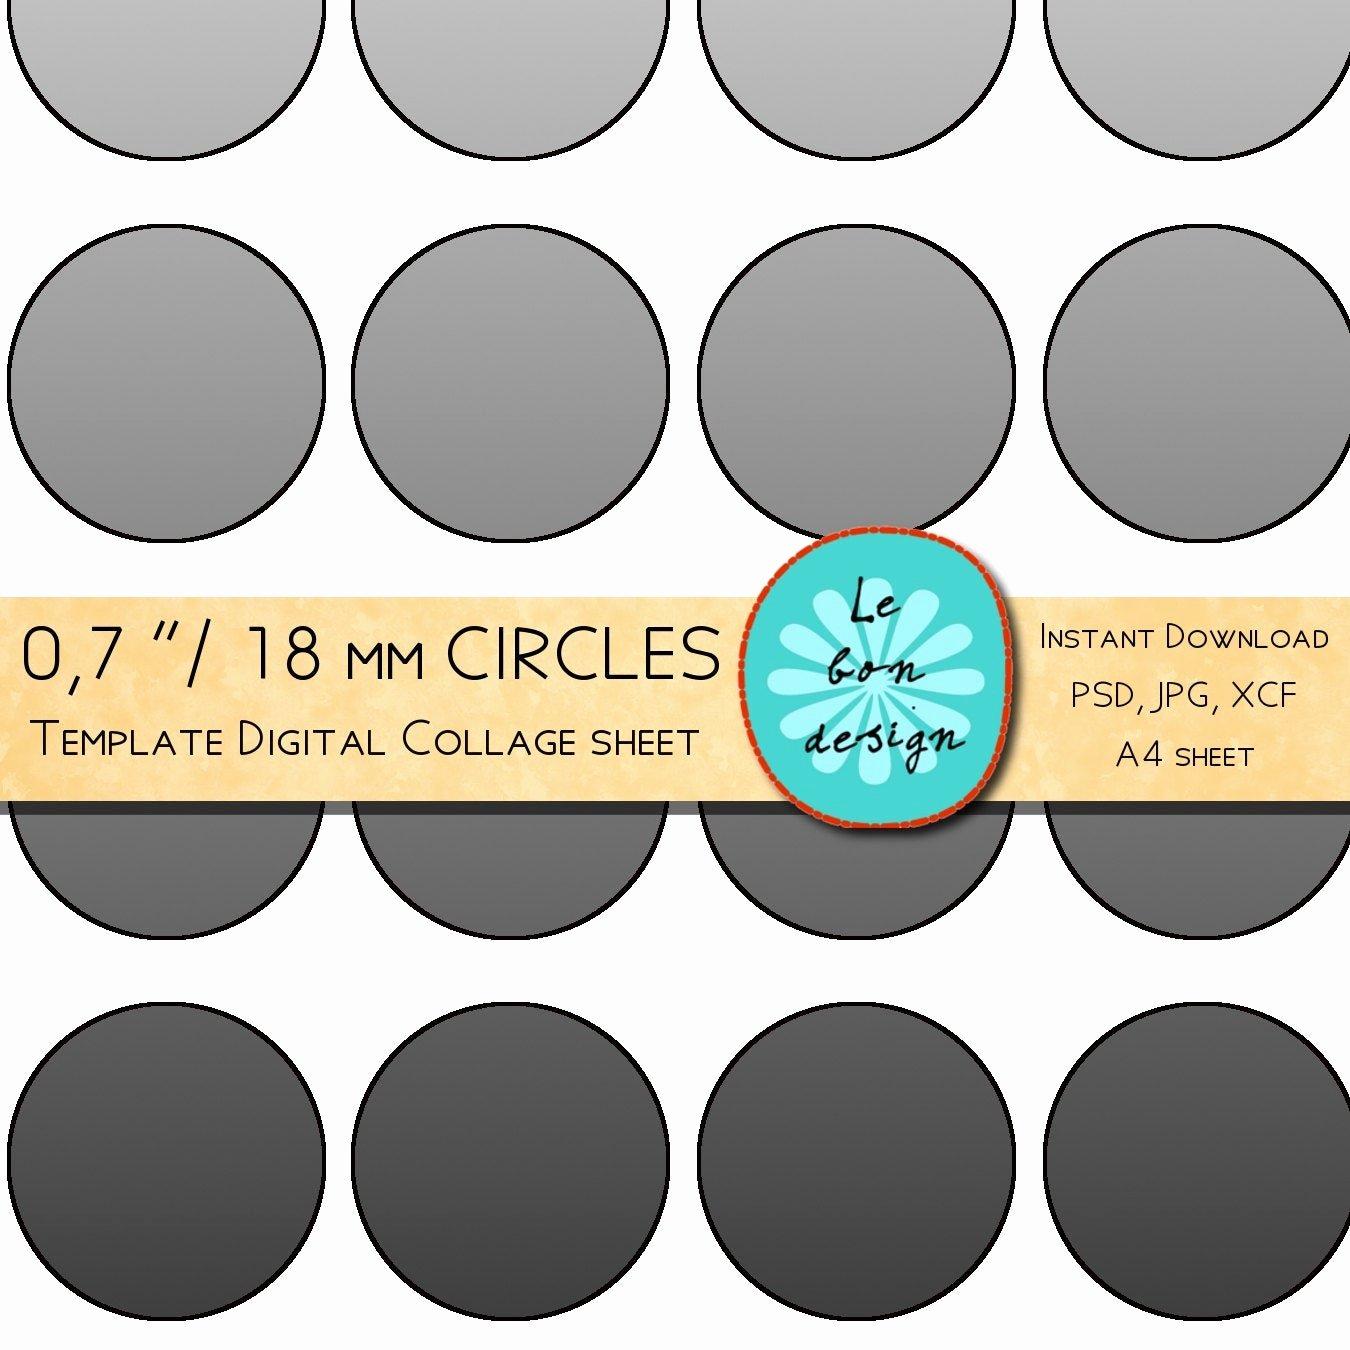 Three Inch Circle Template Fresh 07 Inch 18 Mm Circle Template 40 Circles Diy Collage Sheet